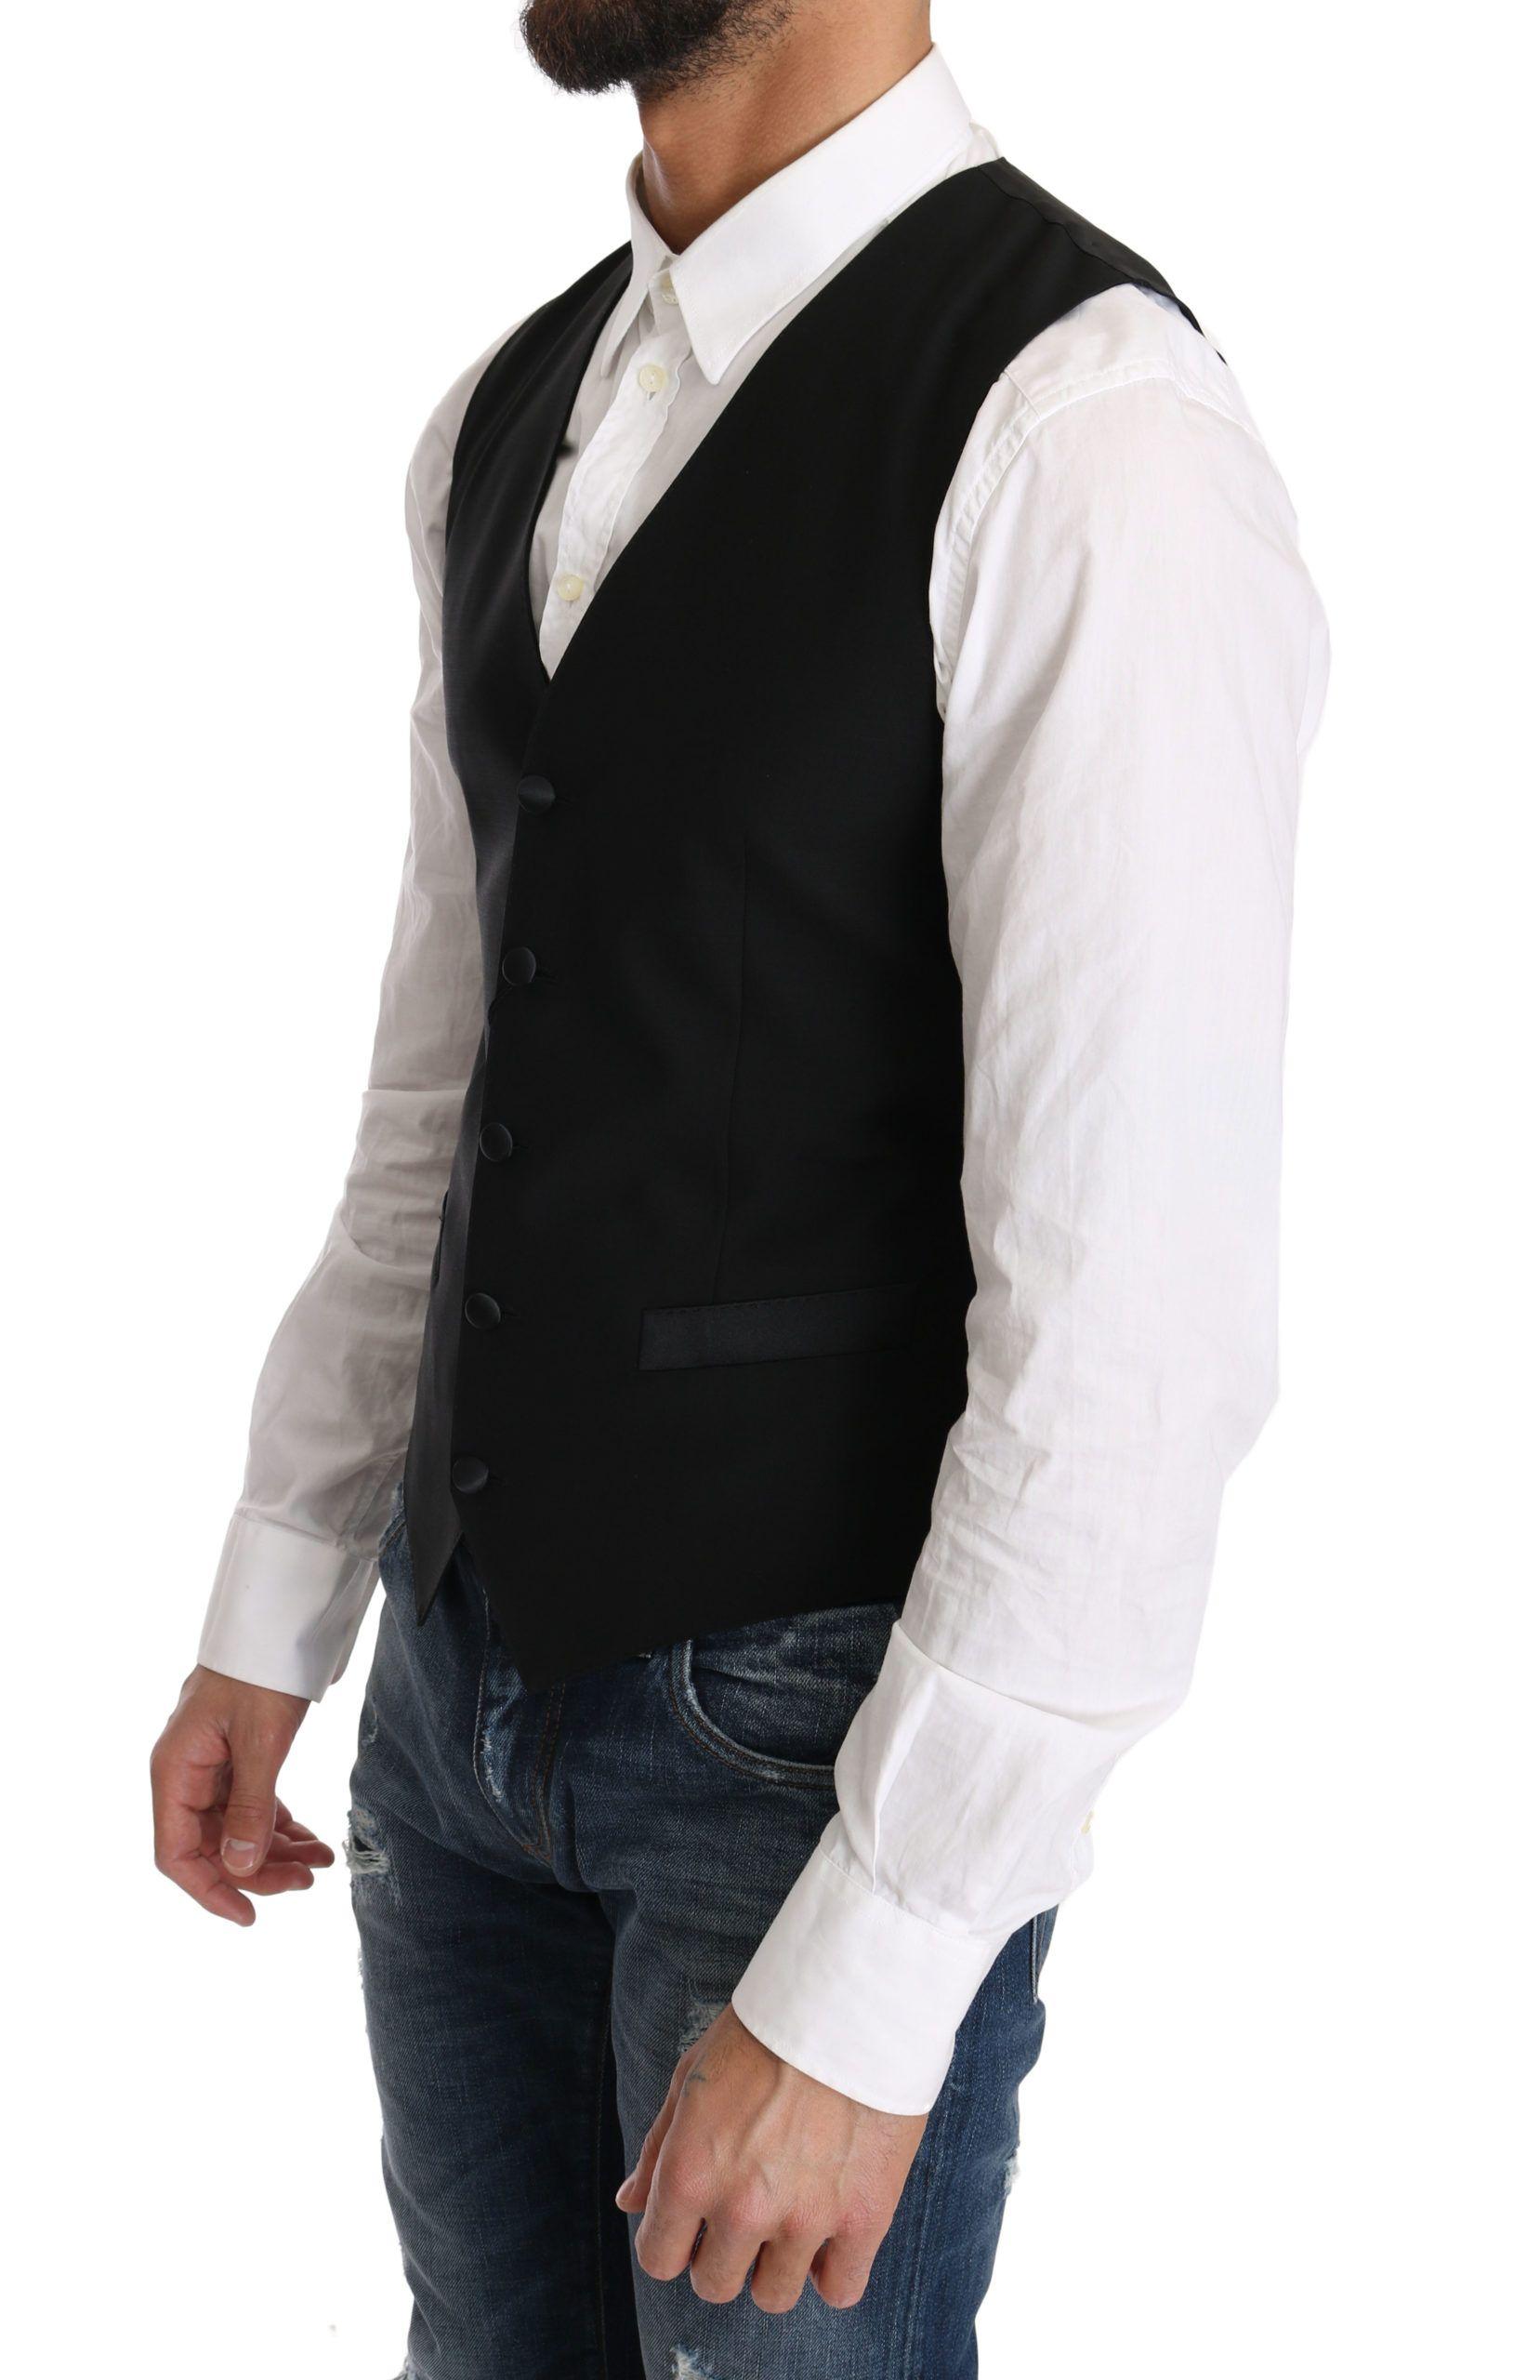 Dolce & Gabbana Black Wool Dress Waistcoat Gillet